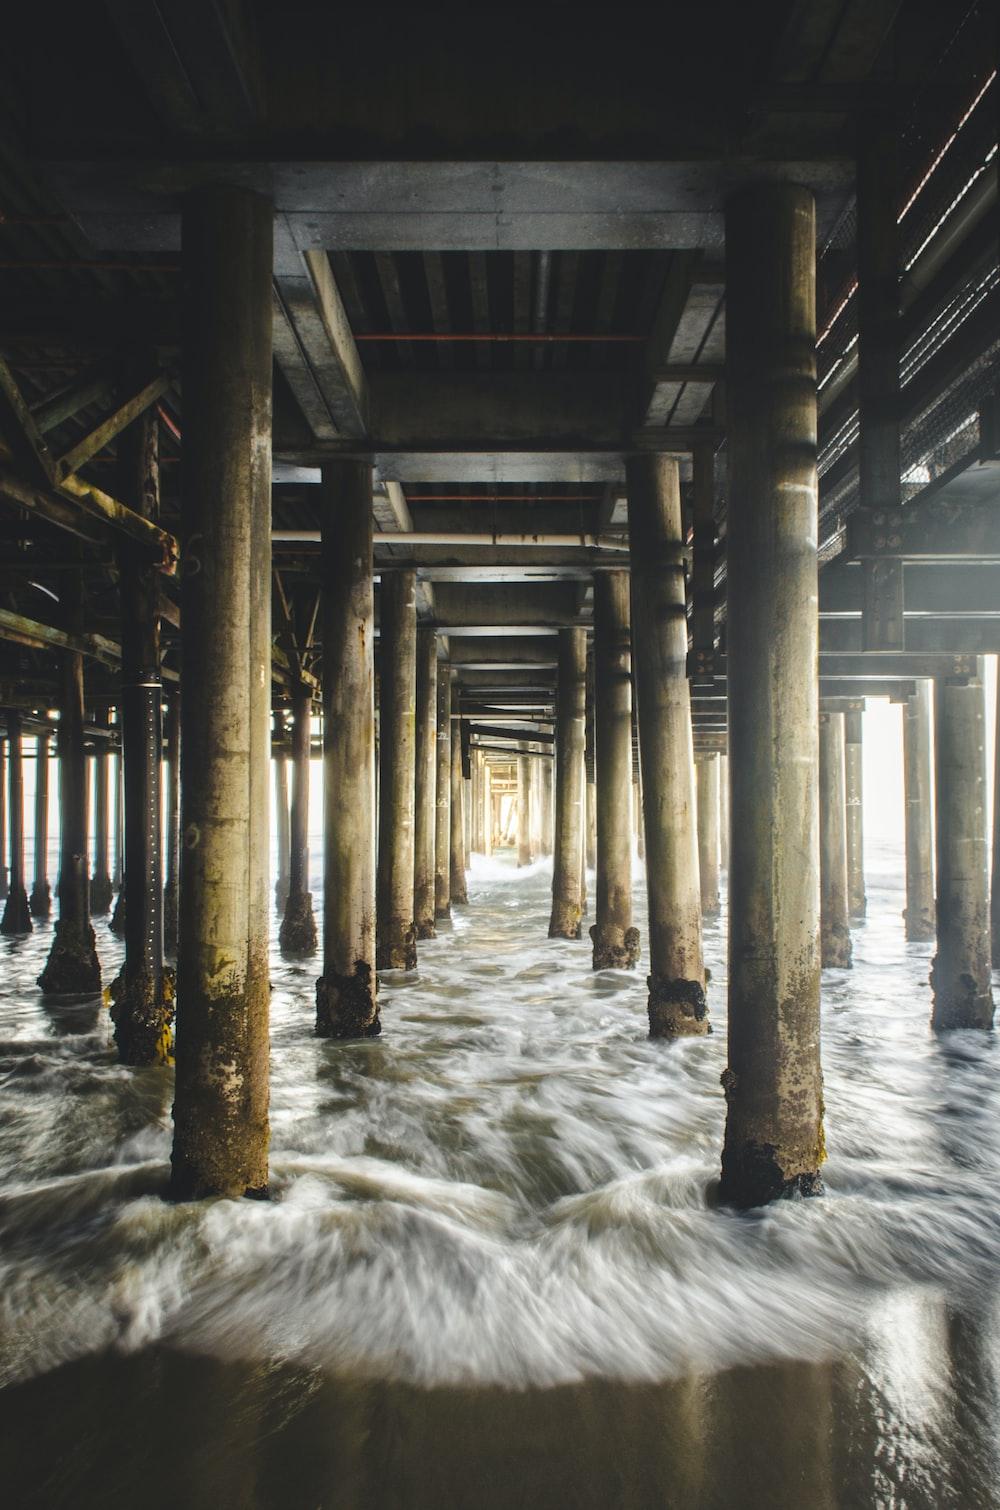 brown and black wooden dock under ocean water